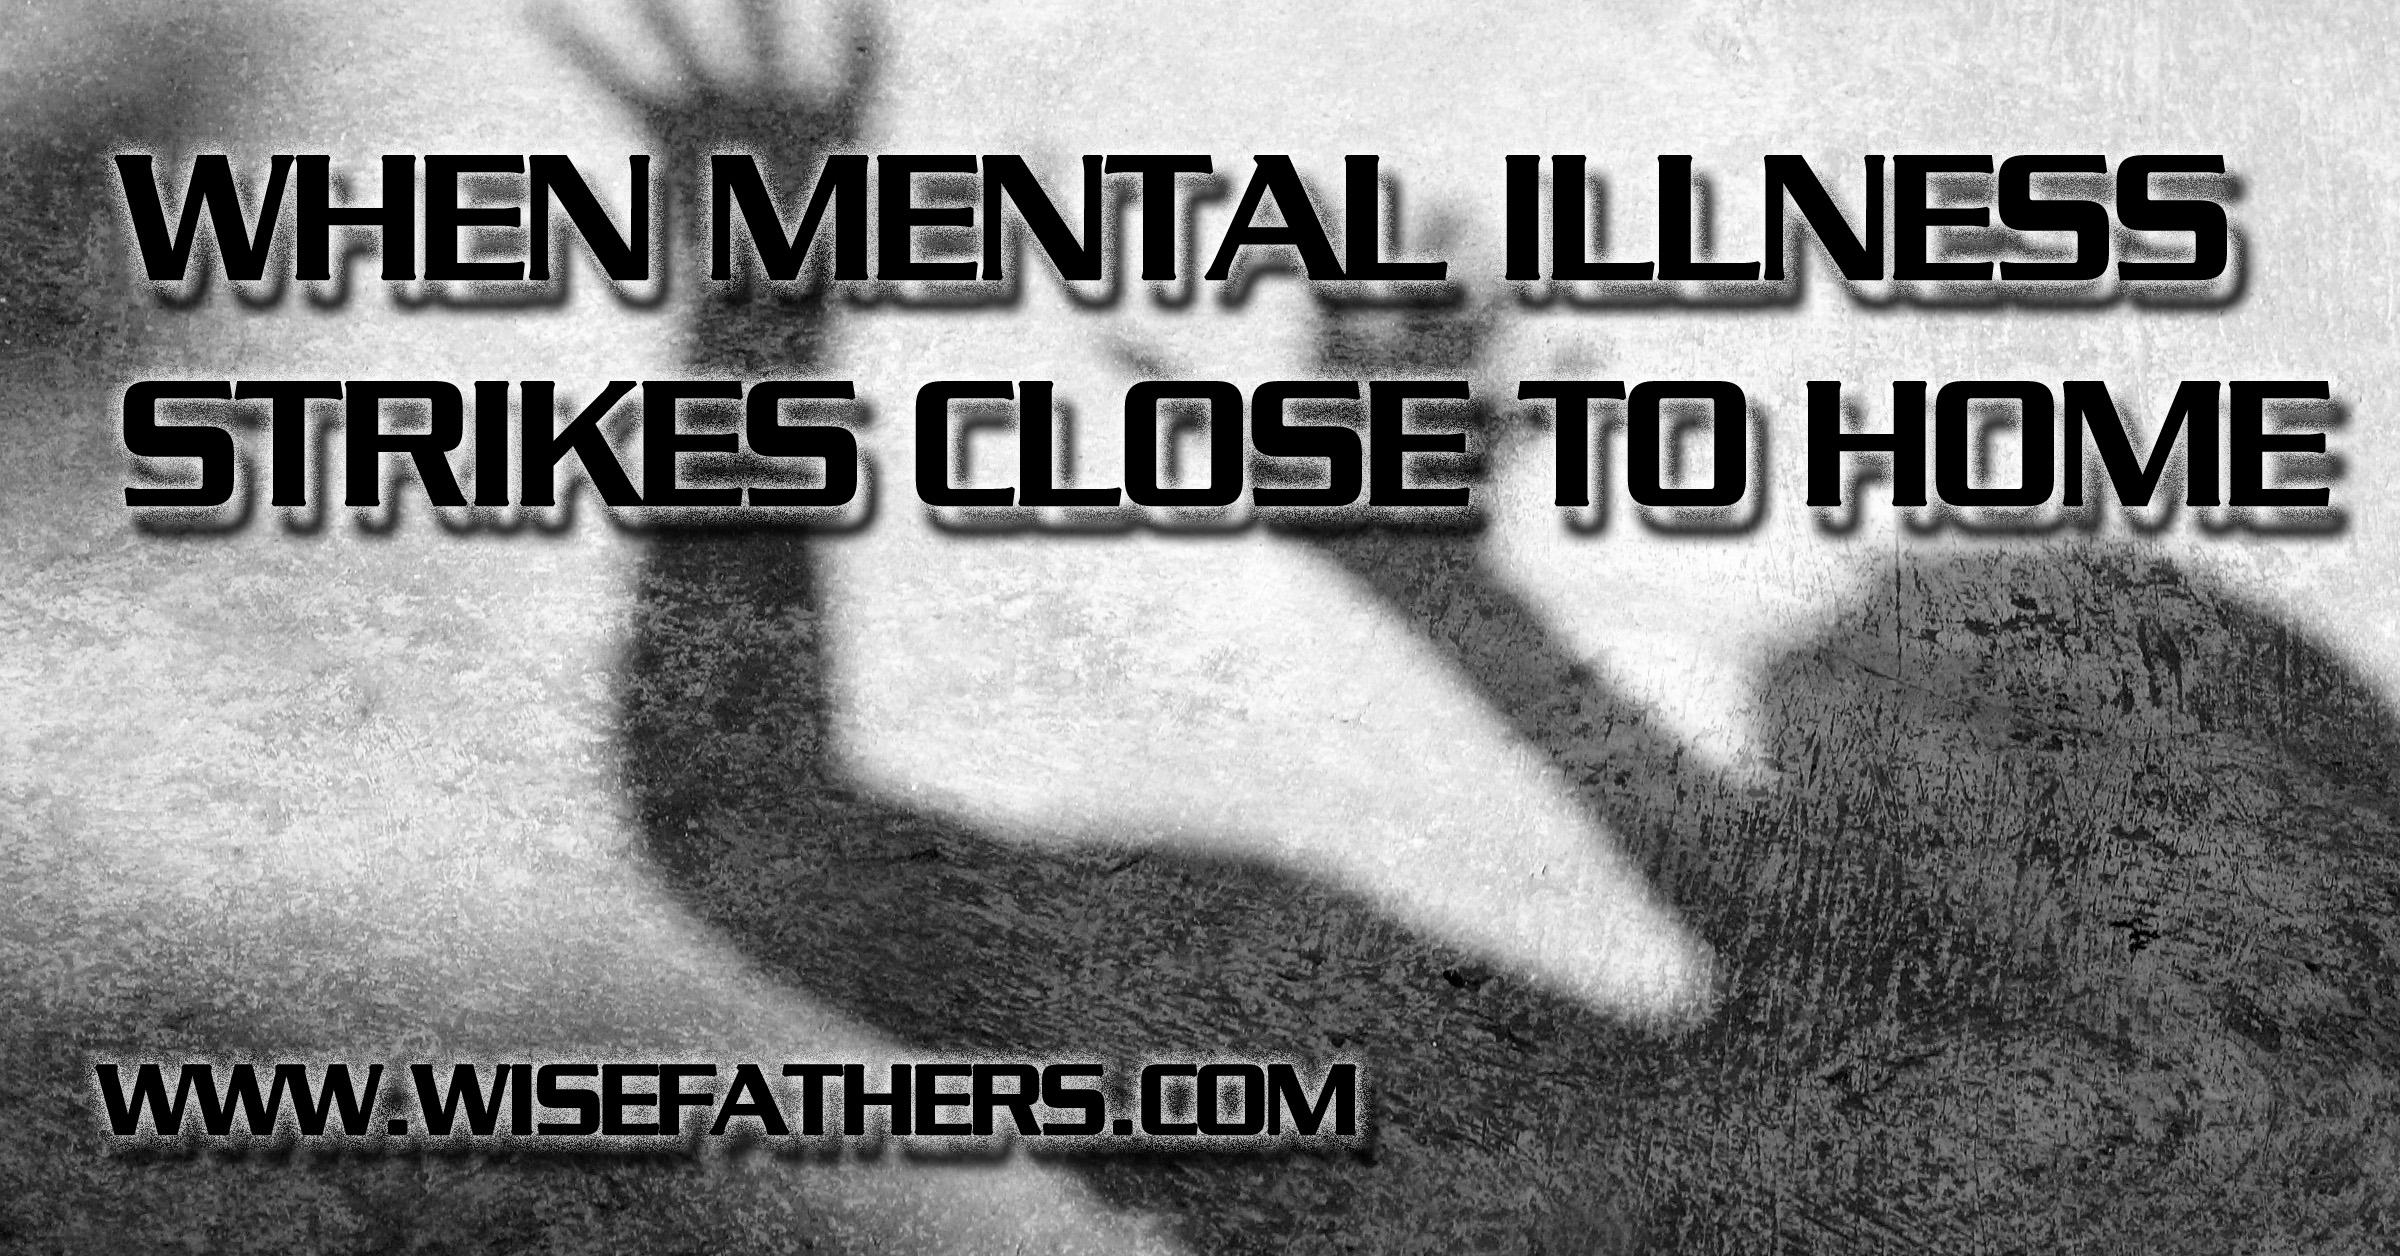 When Mental Illness Strikes Close to Home